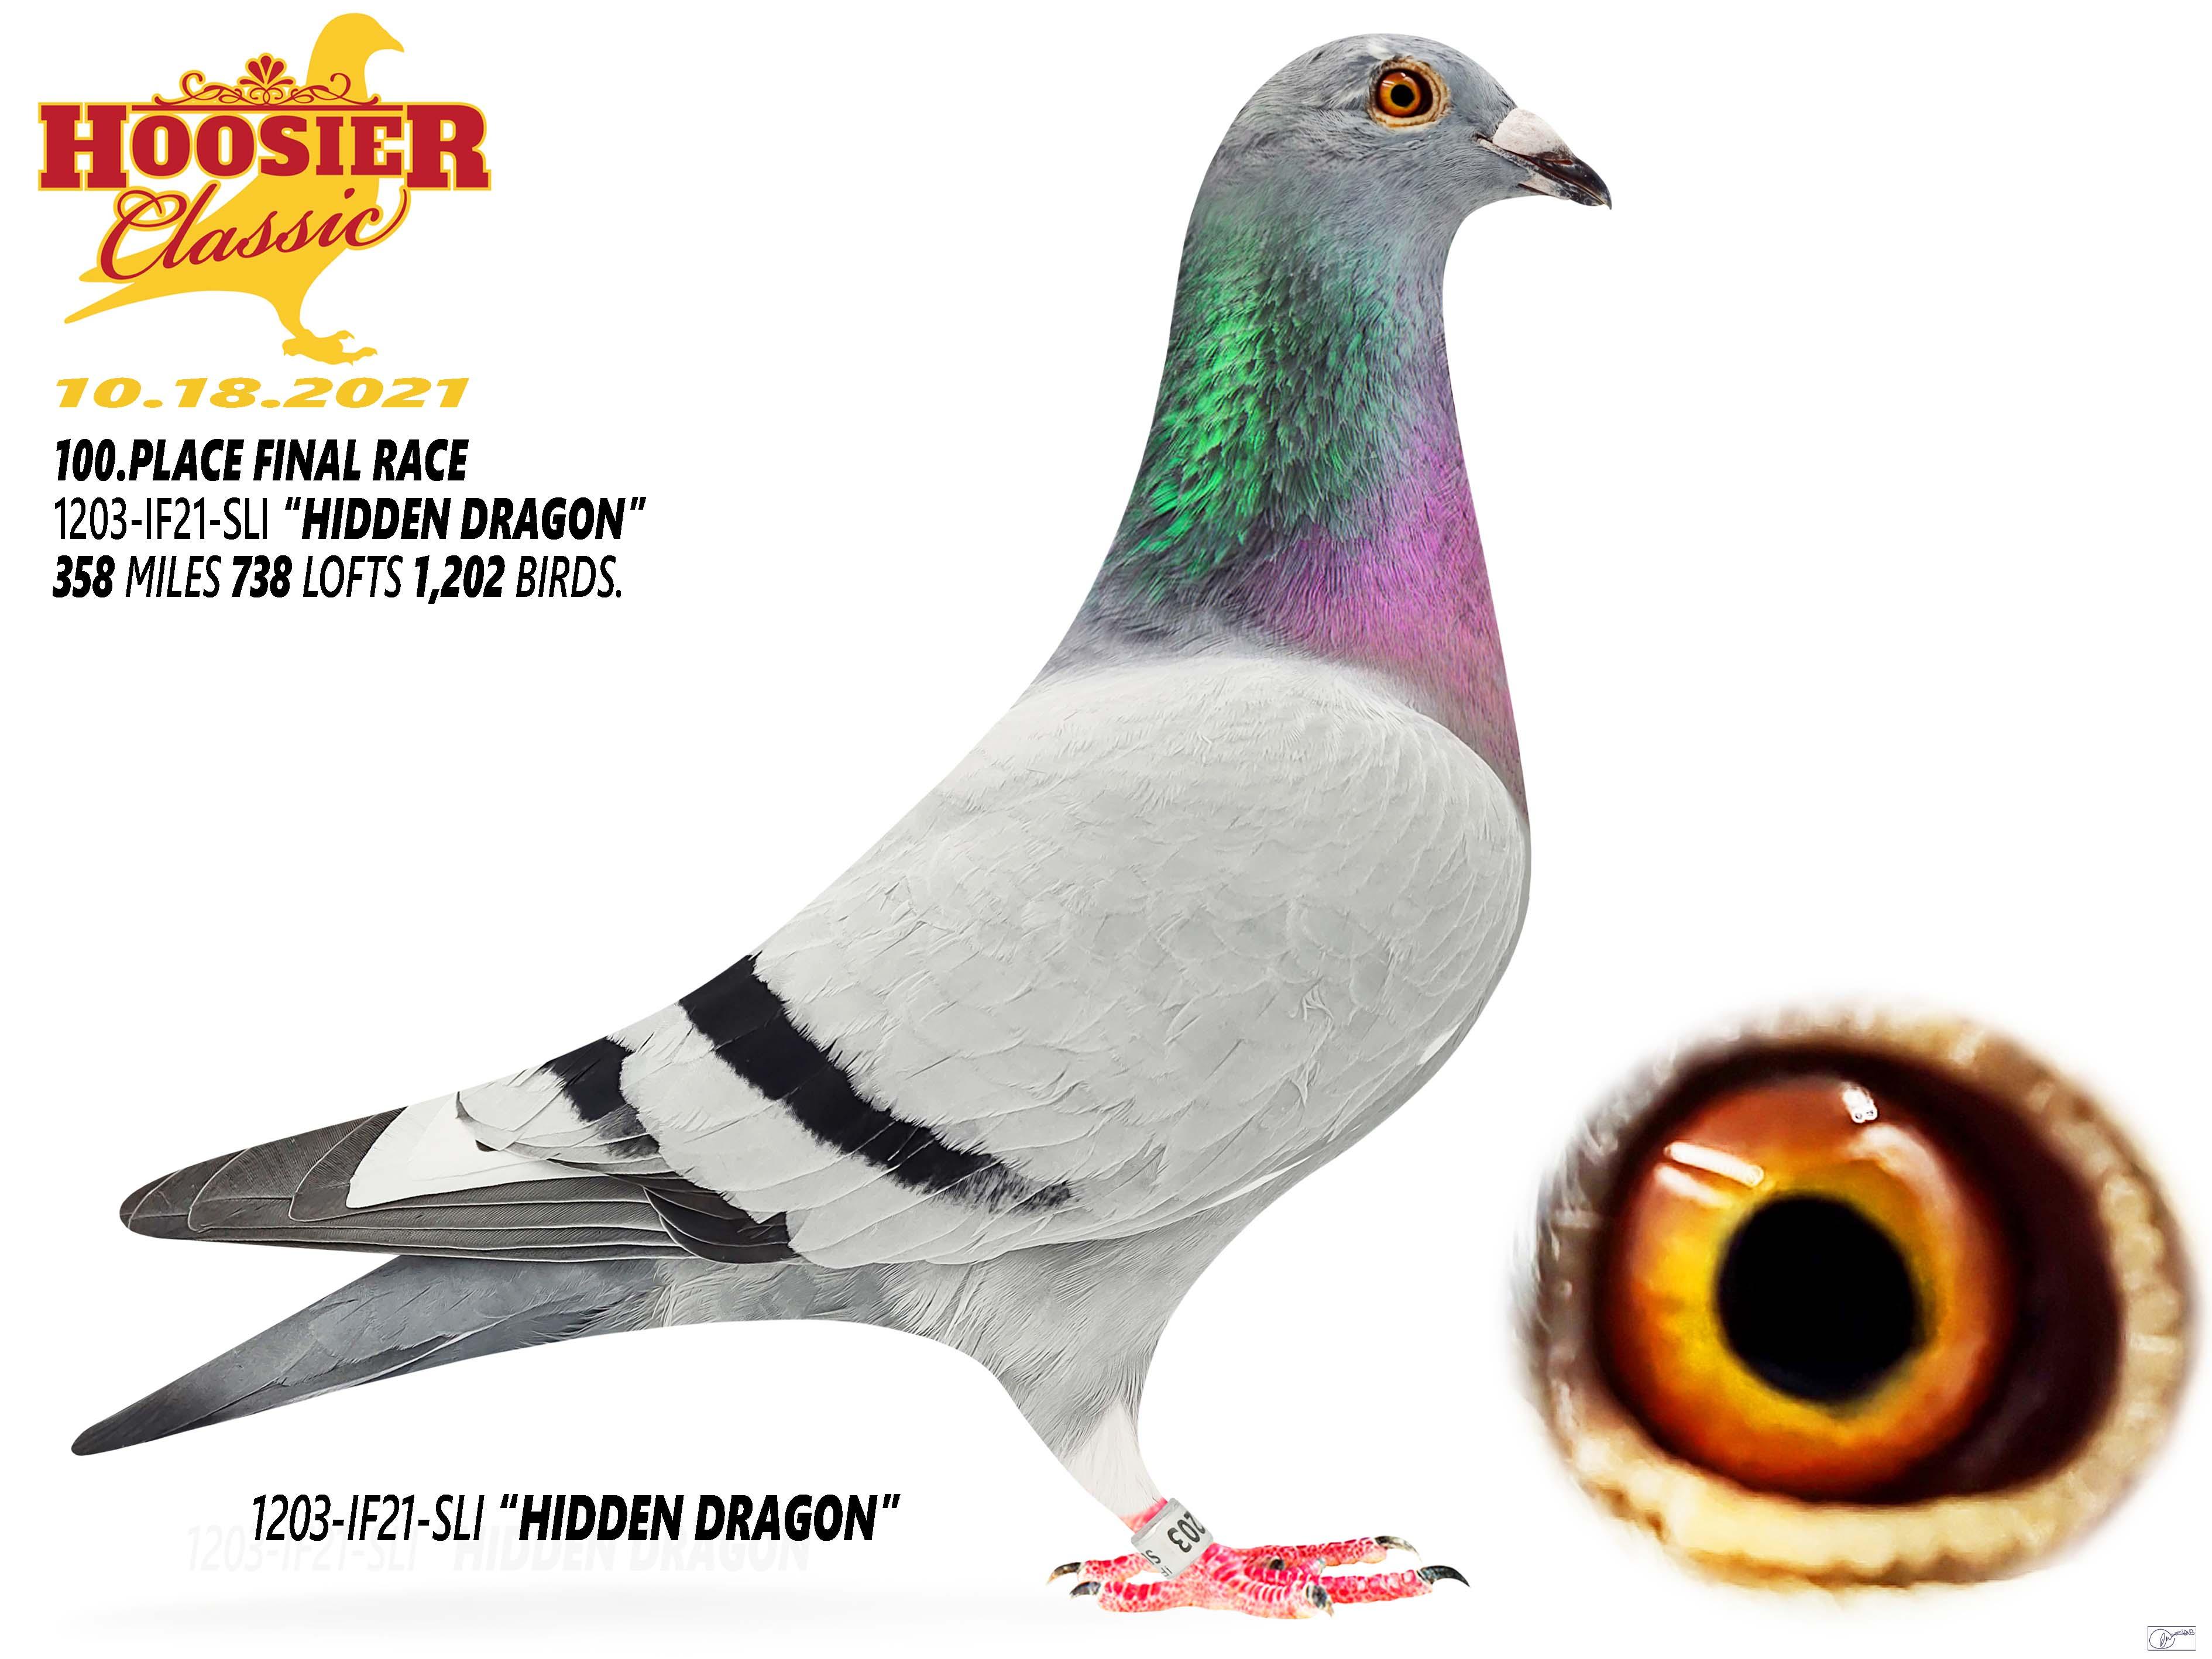 100thPlace 2021 Hoosier Classic Danowski Loft - NY1203-IF21-SLIHidden Dragon  BB Flt C